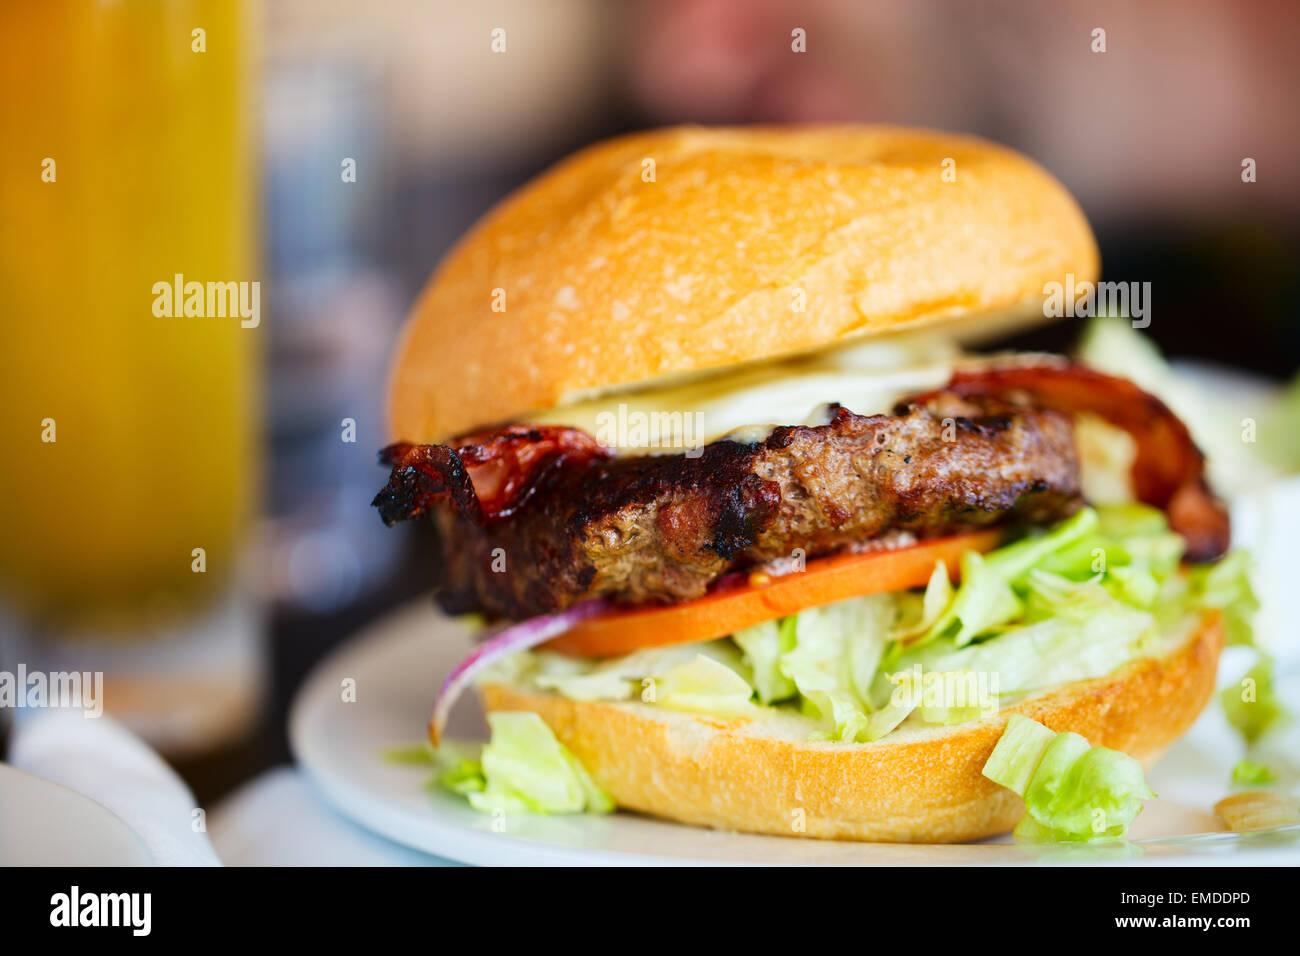 Burger - Stock Image